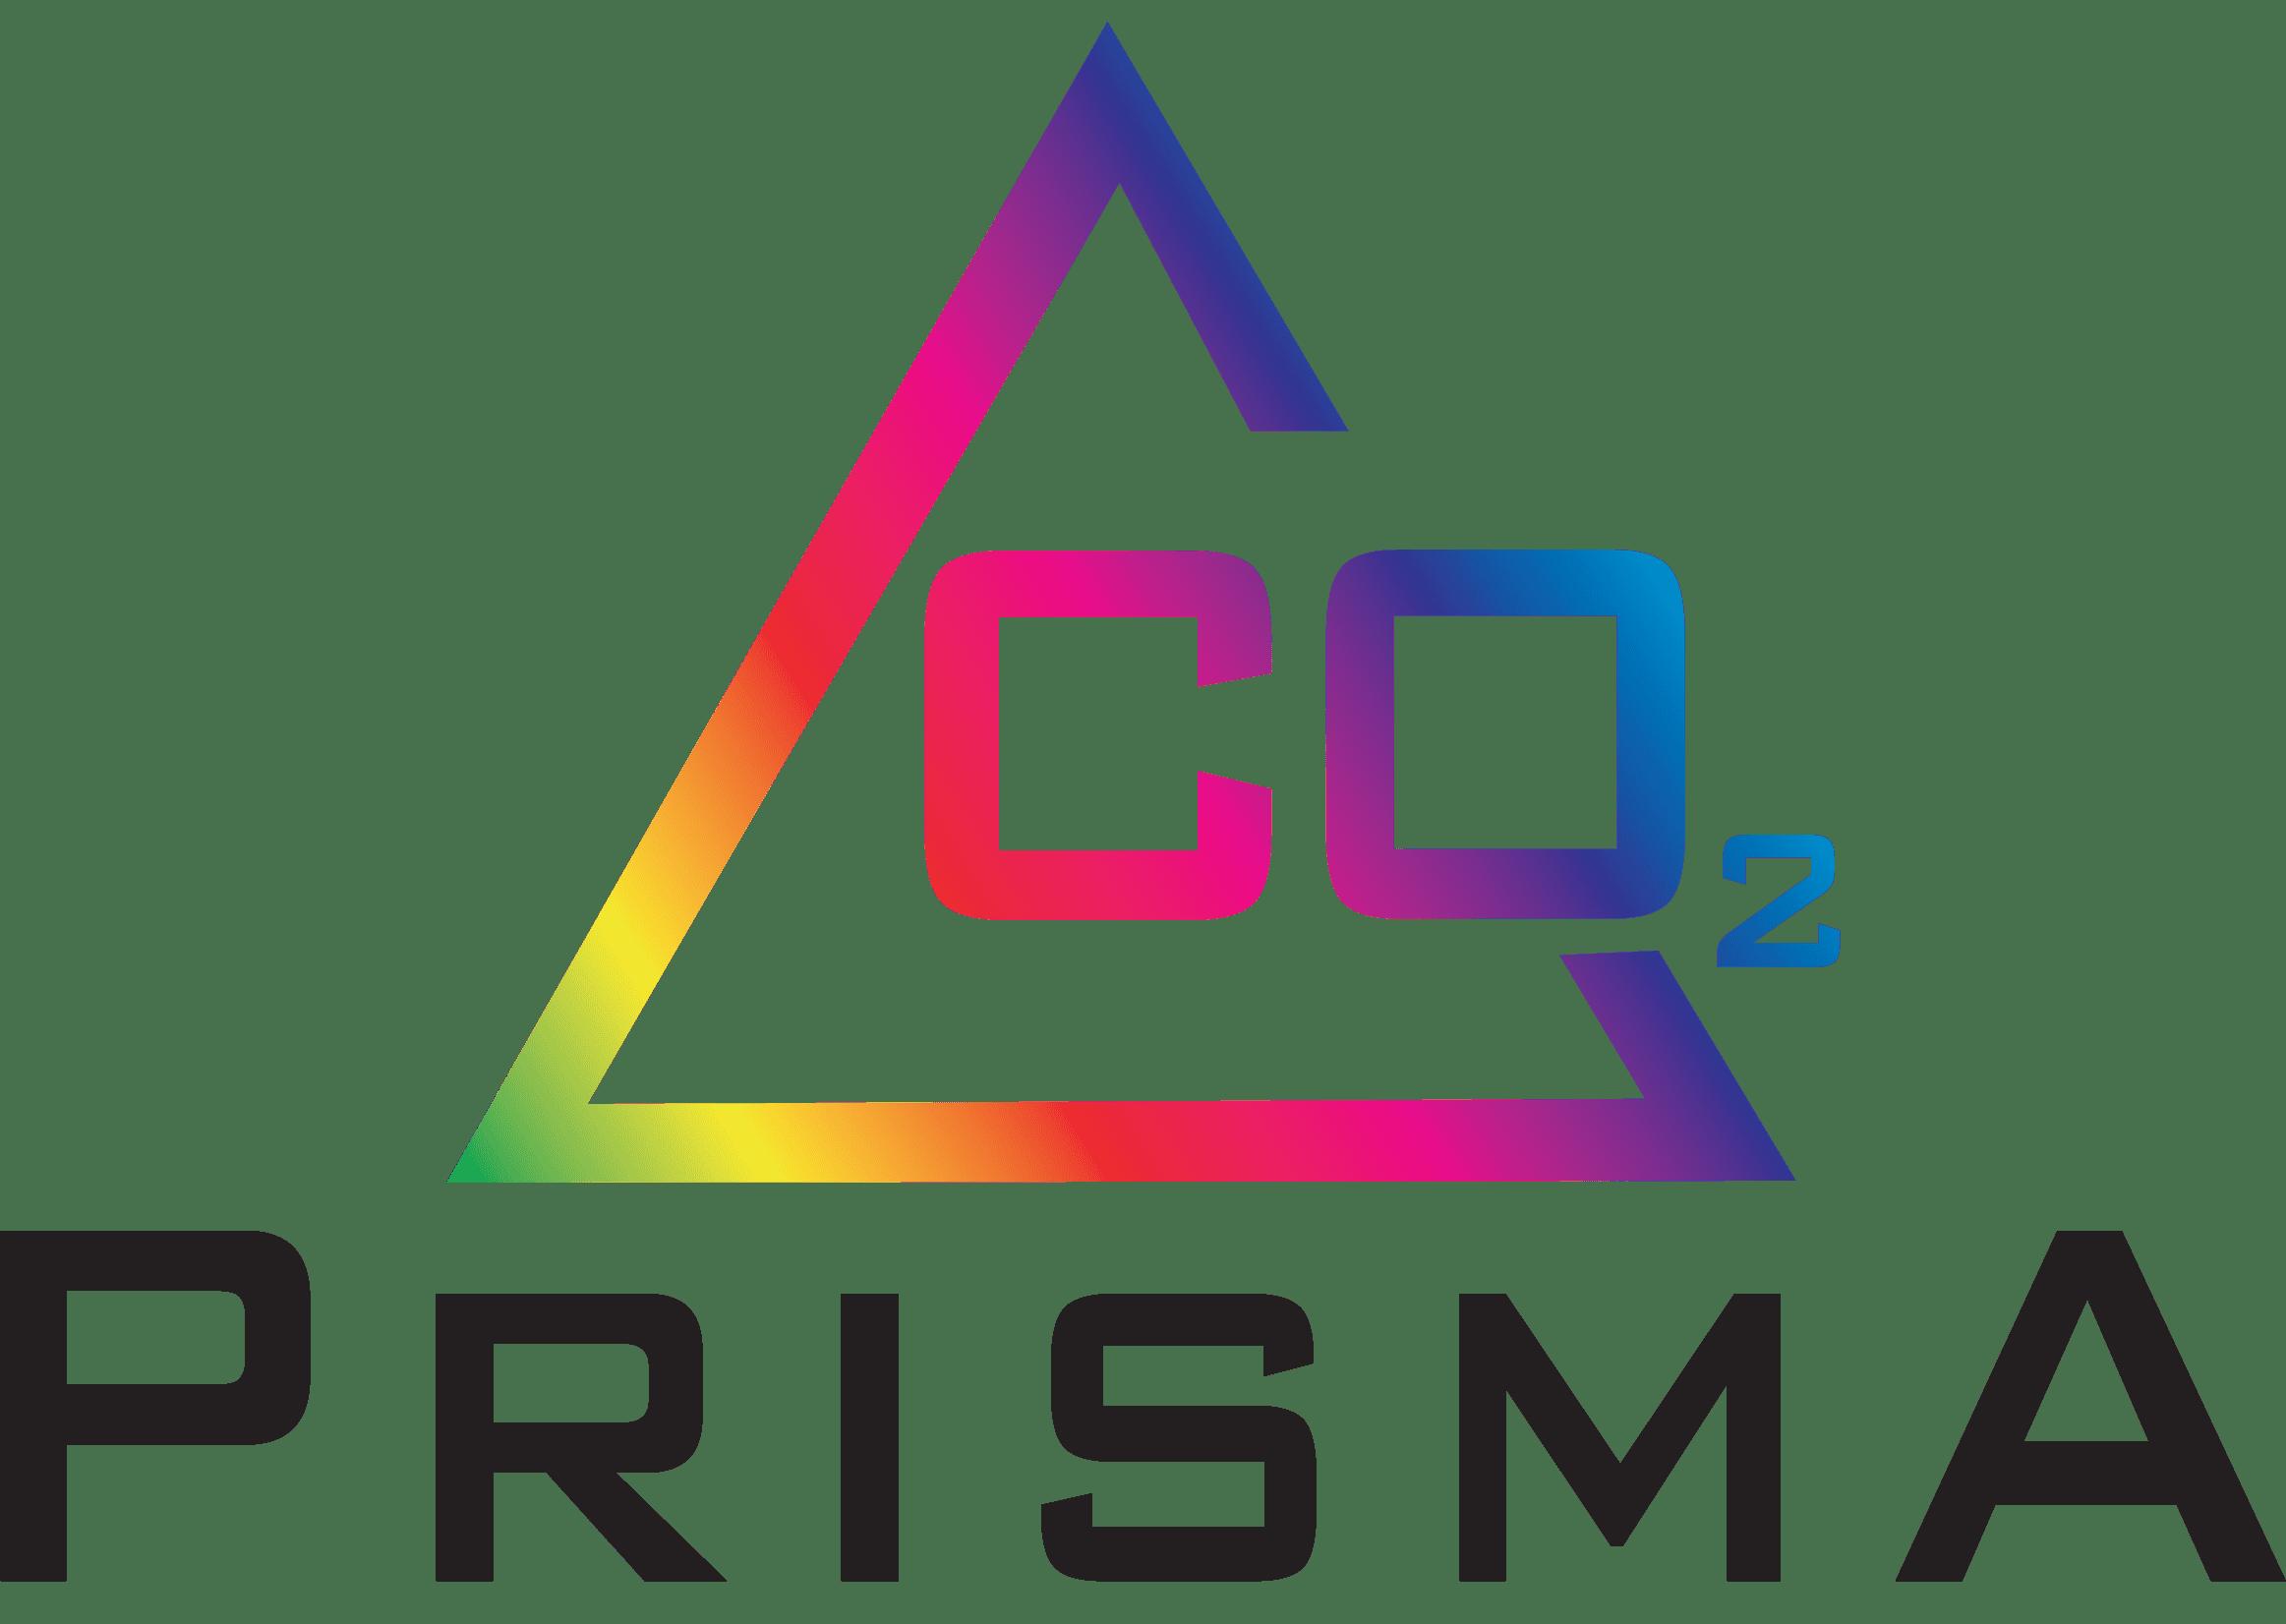 PrIsMa   ACT programme (Accelerating CCS Technologies)